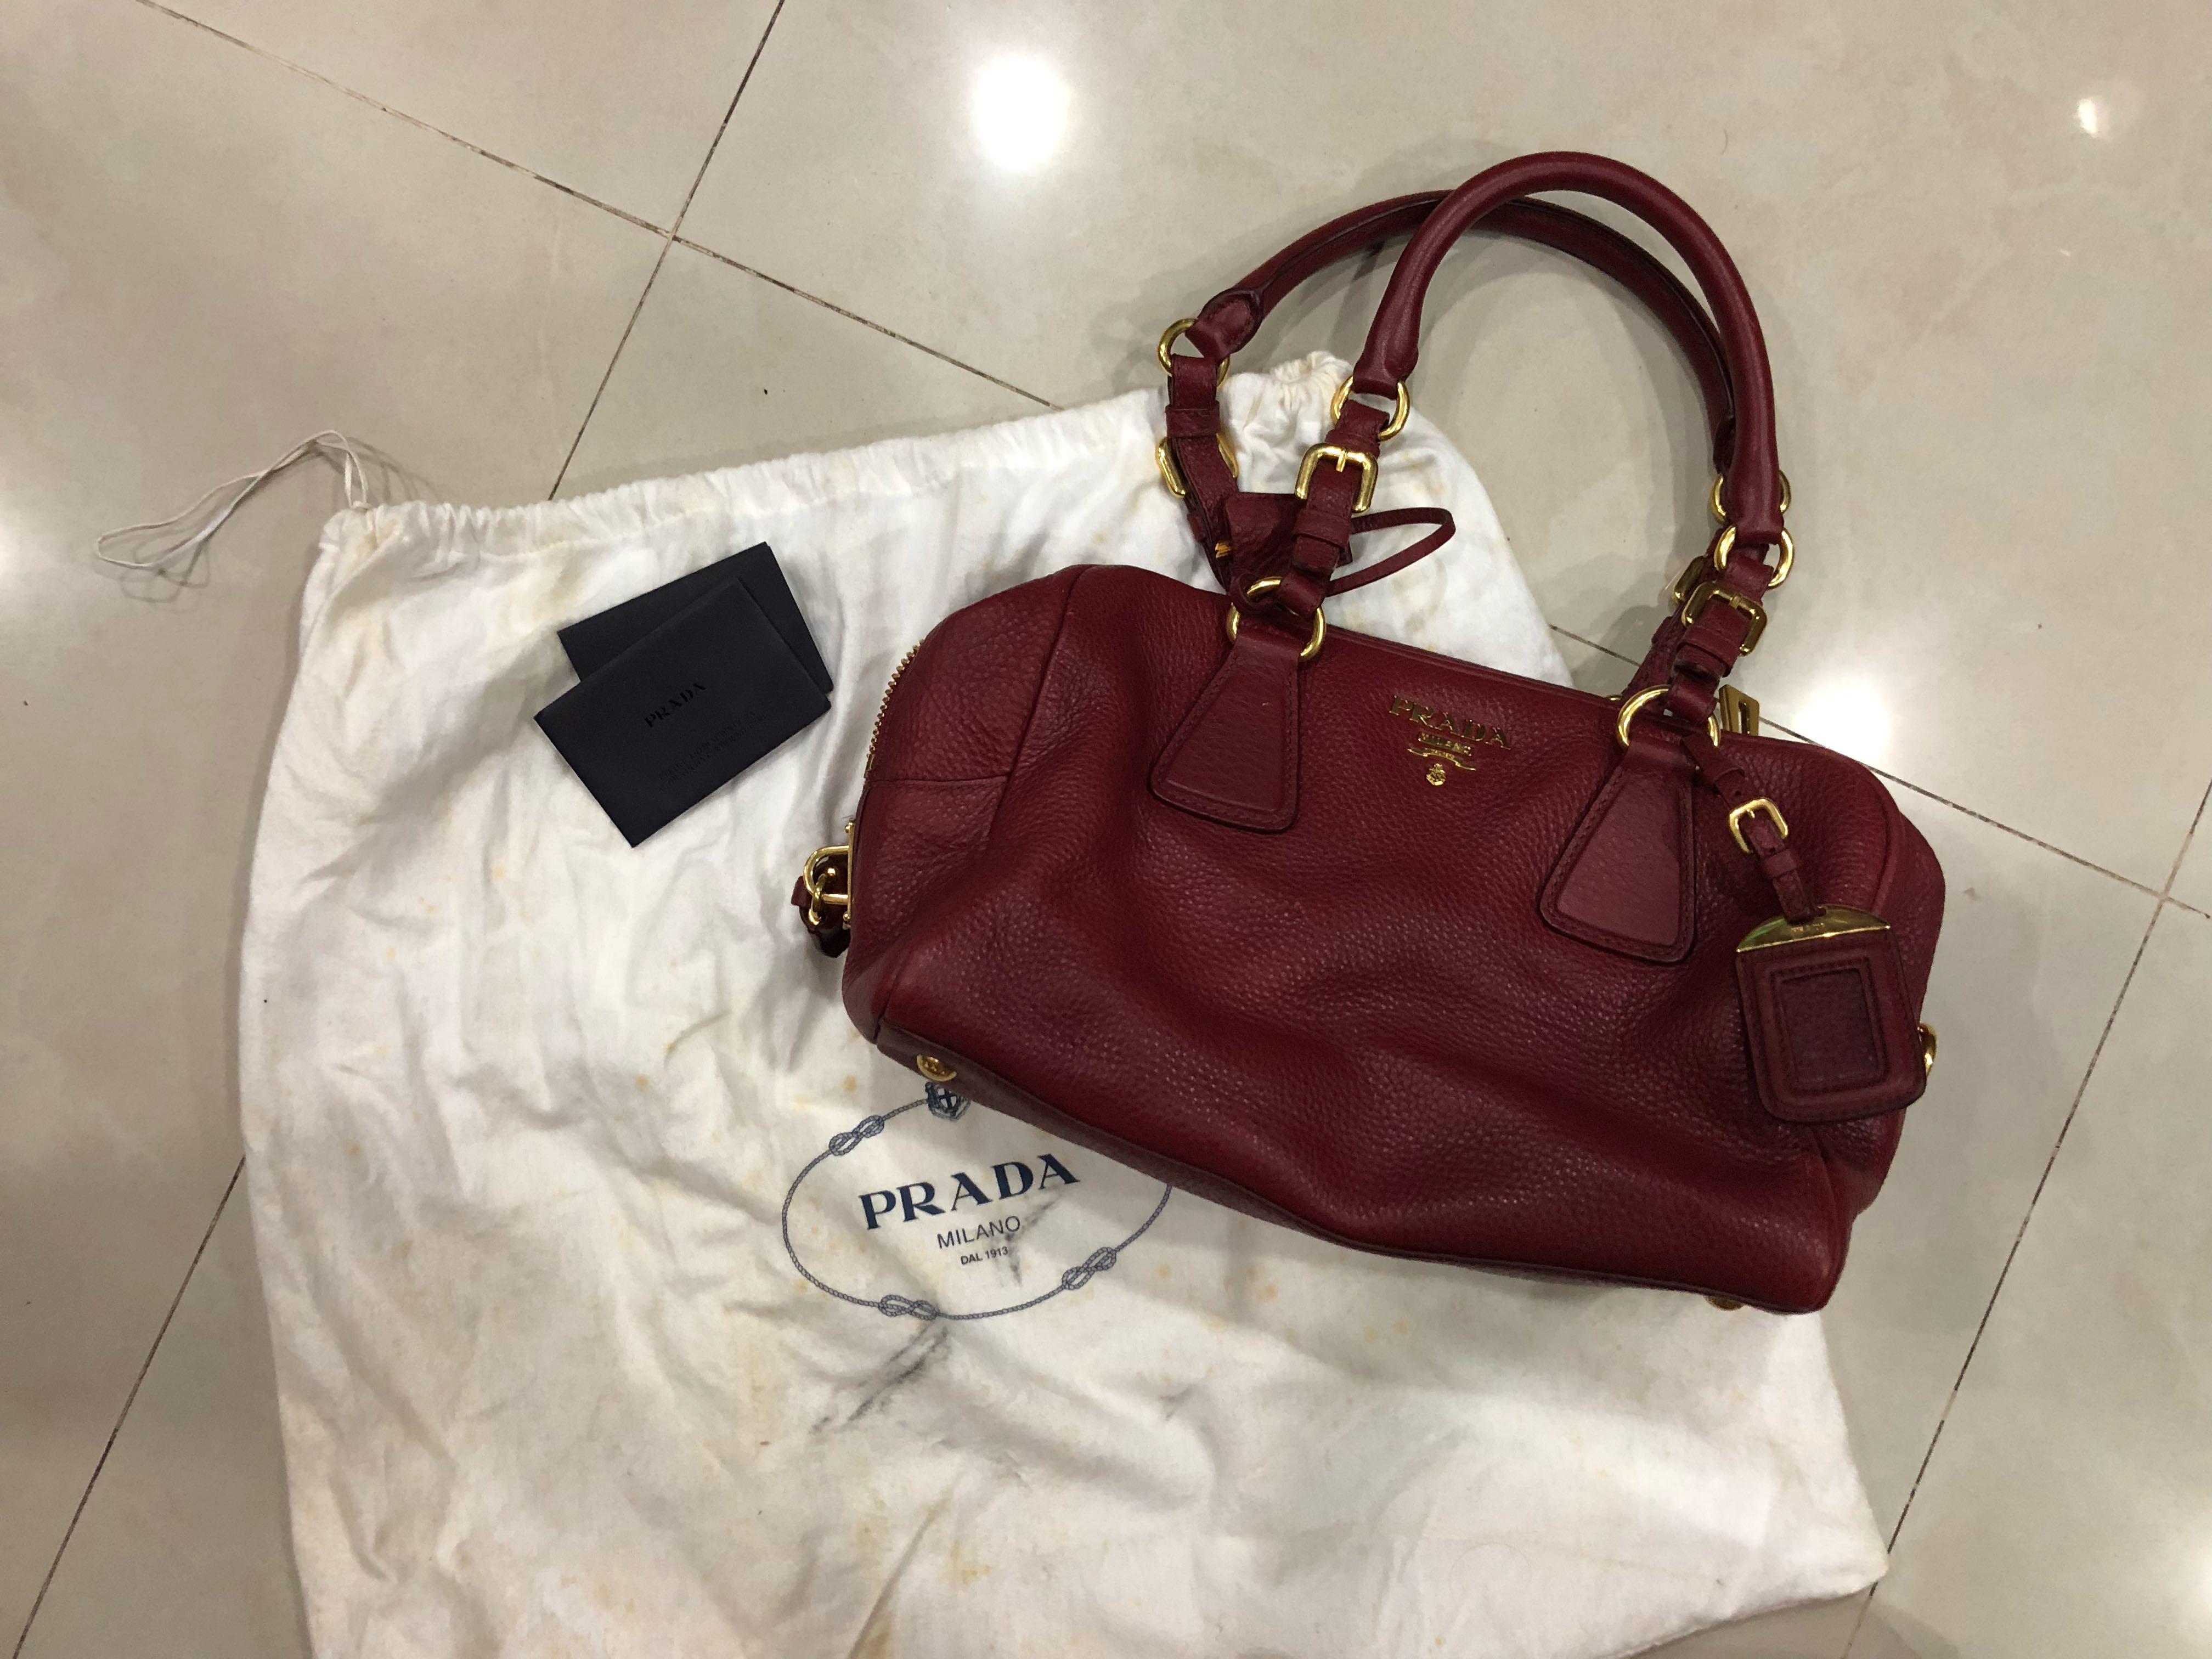 3c5af644b620dc Prada handbag, Women's Fashion, Bags & Wallets, Handbags on Carousell